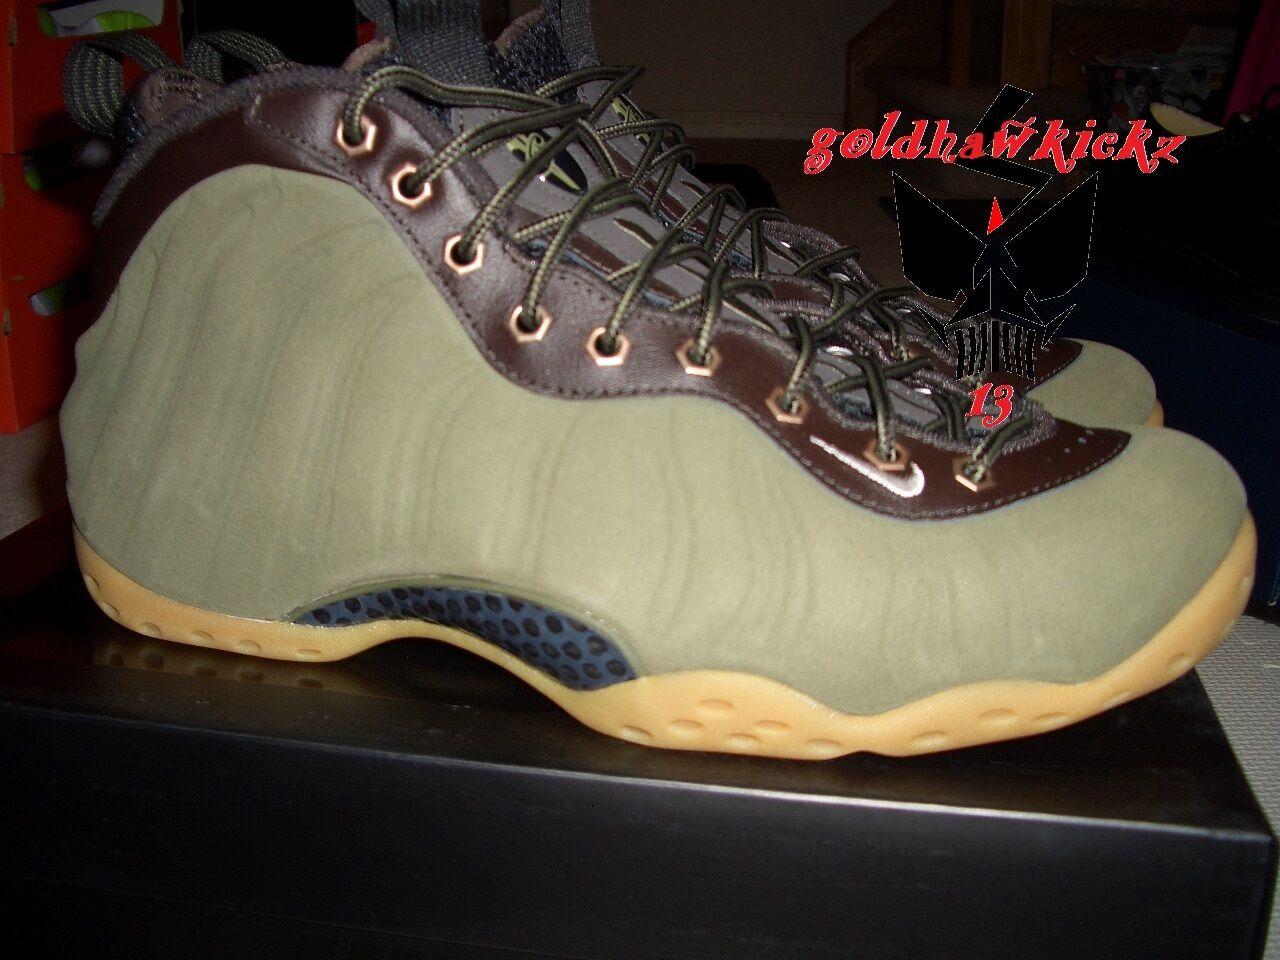 Nike Air Foamposite prm olive green suede gum sole penny hardaway 575420 200